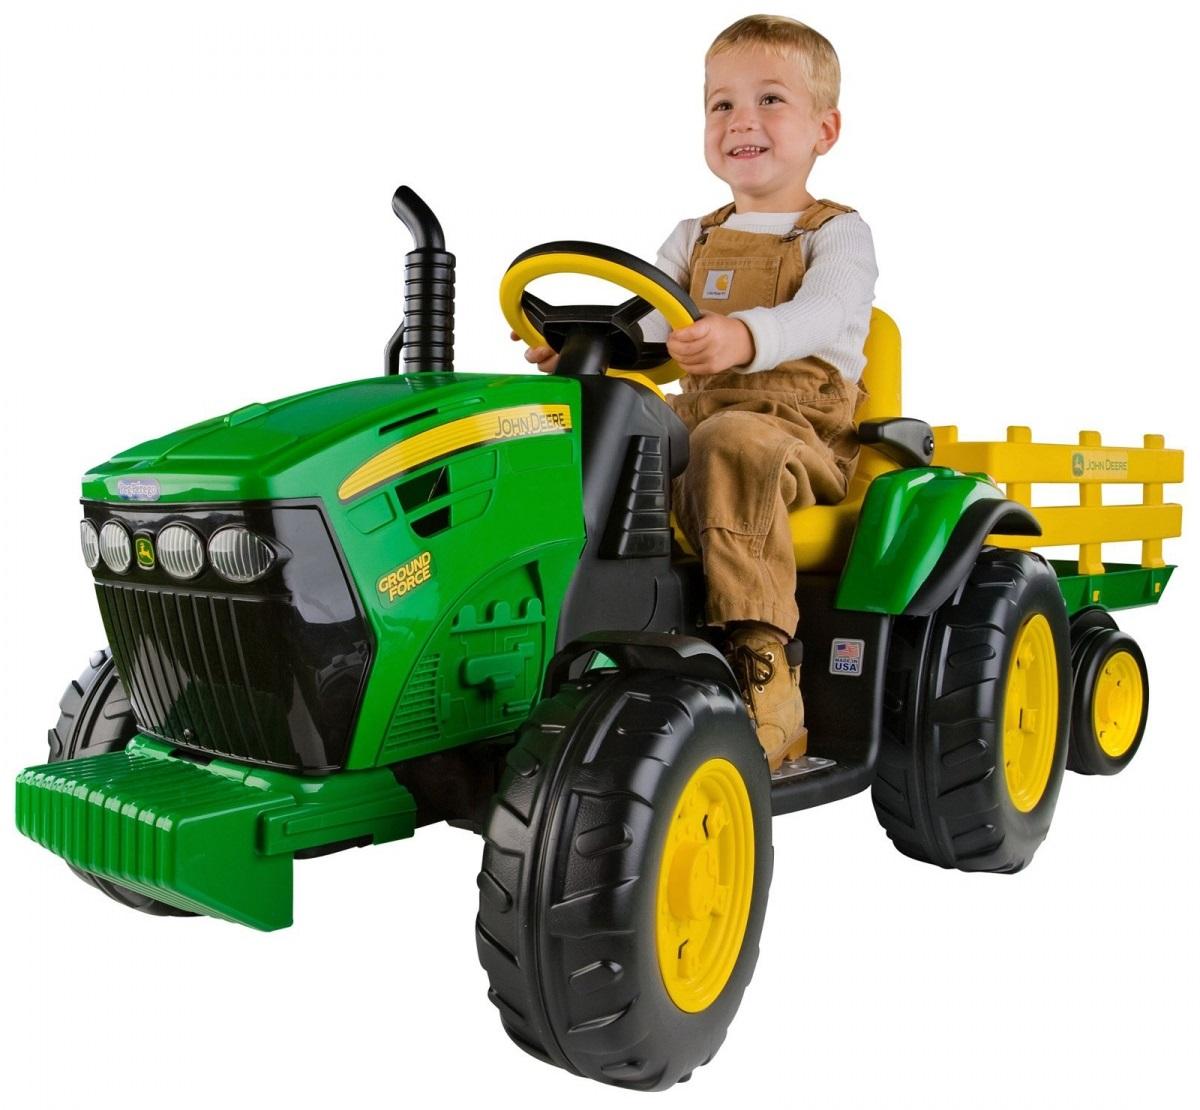 Электроприводной трактор Peg-Perego JD Ground Force trailer OR0047 - Детские квадроциклы на аккумуляторе, артикул: 97321